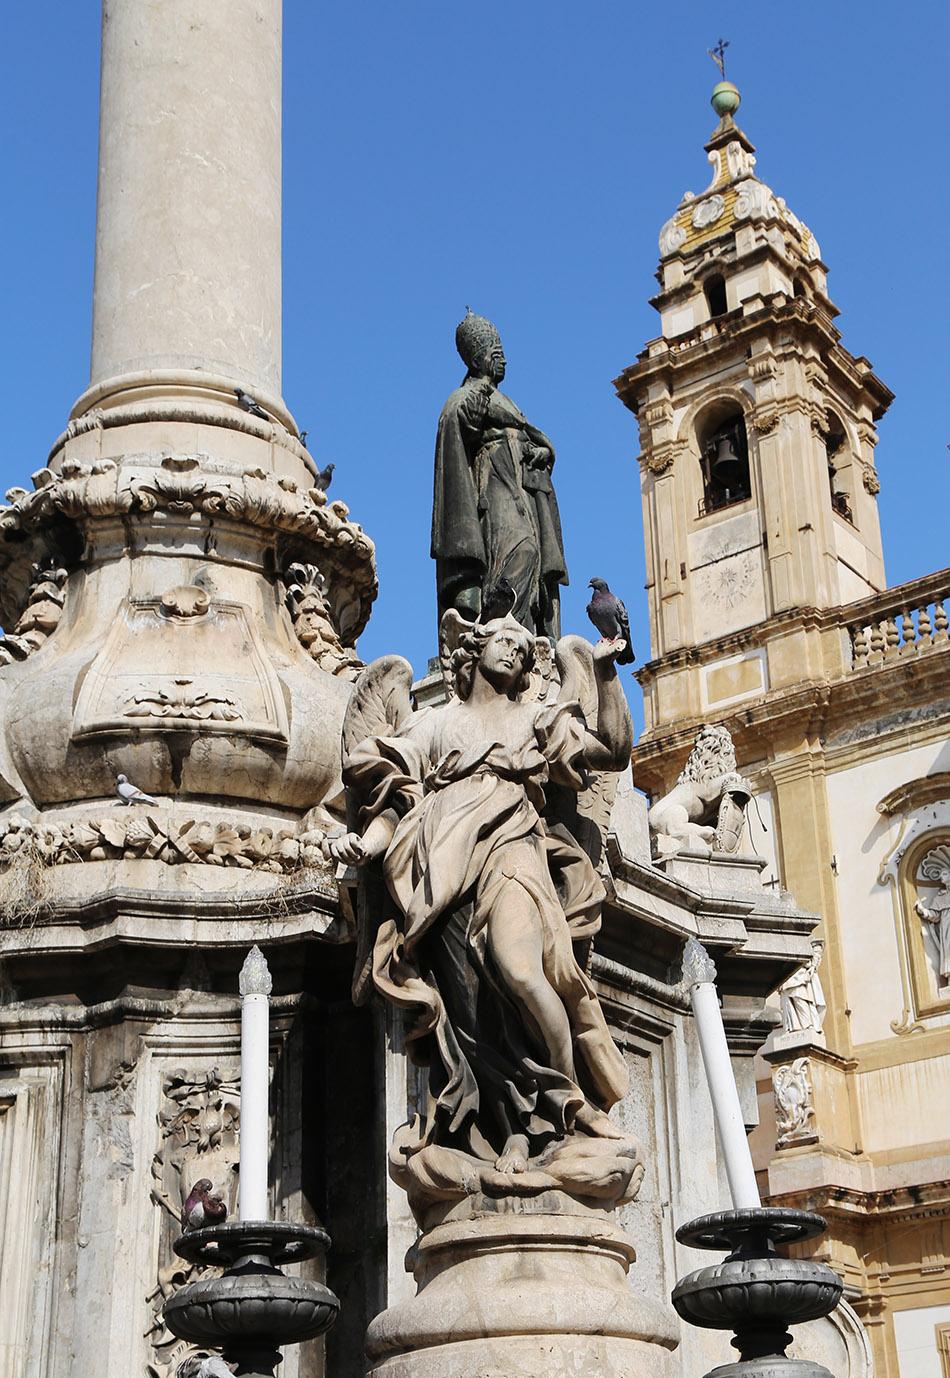 Fabian Fröhlich, Palermo, Piazza San Domenico